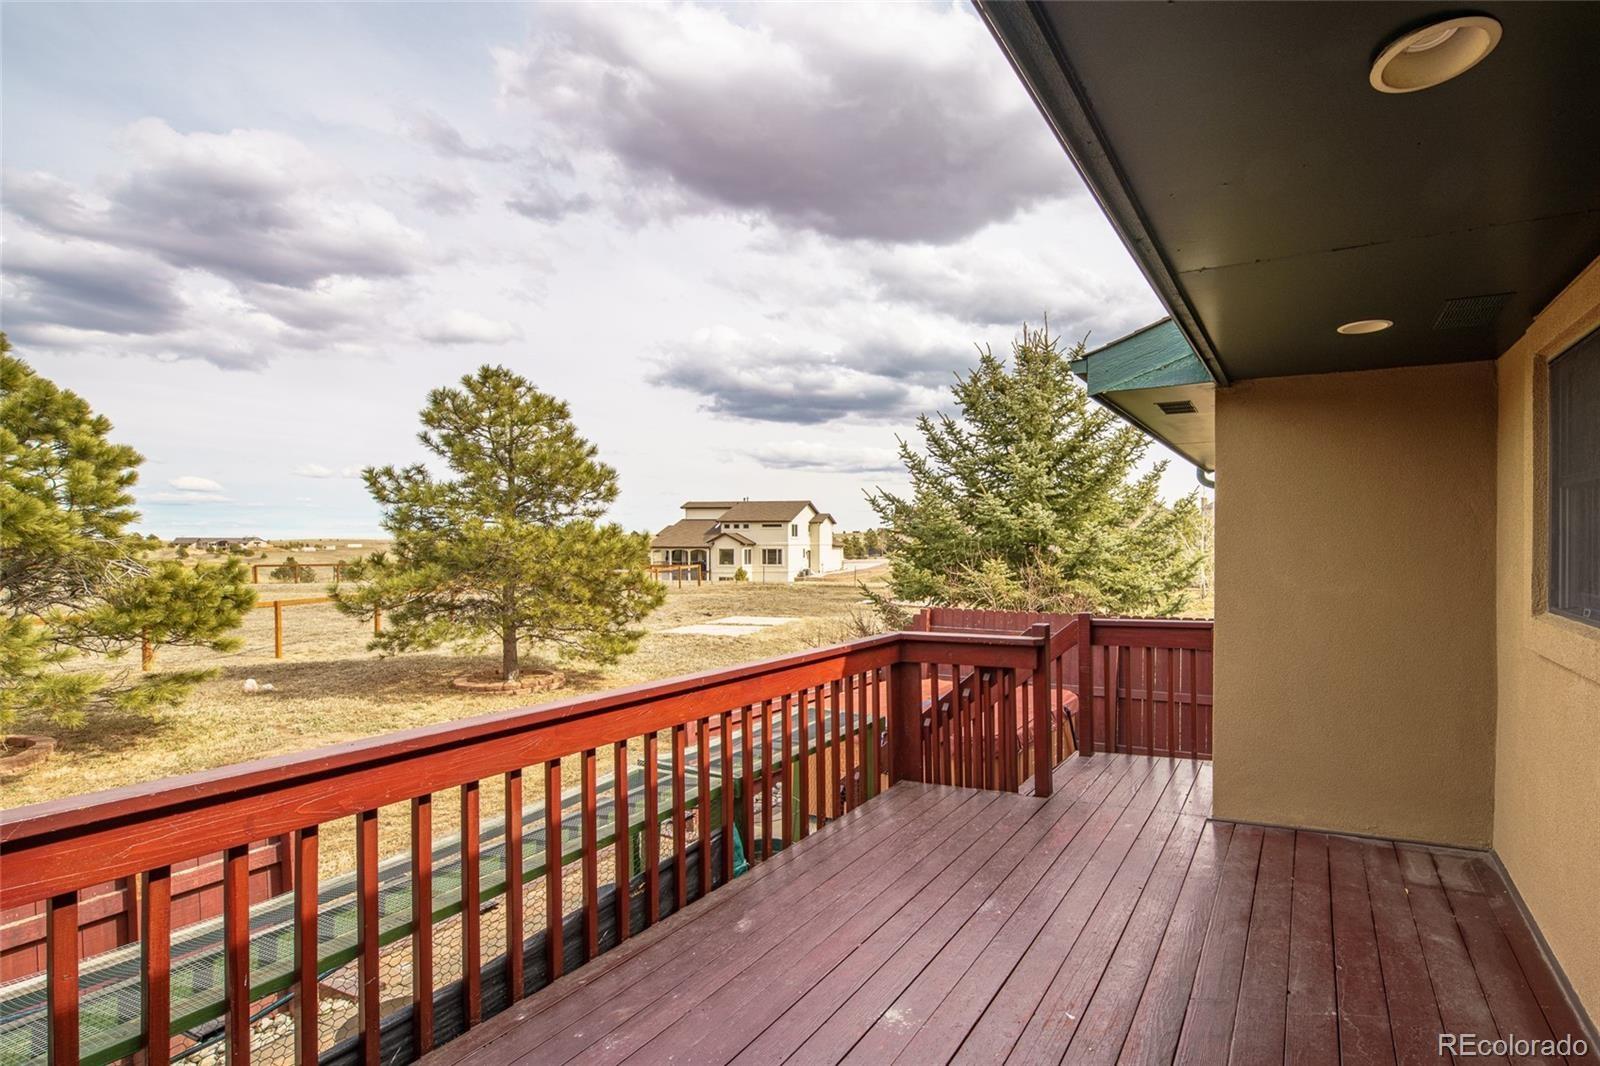 MLS# 9205685 - 17 - 17720 Pioneer Crossing, Colorado Springs, CO 80908